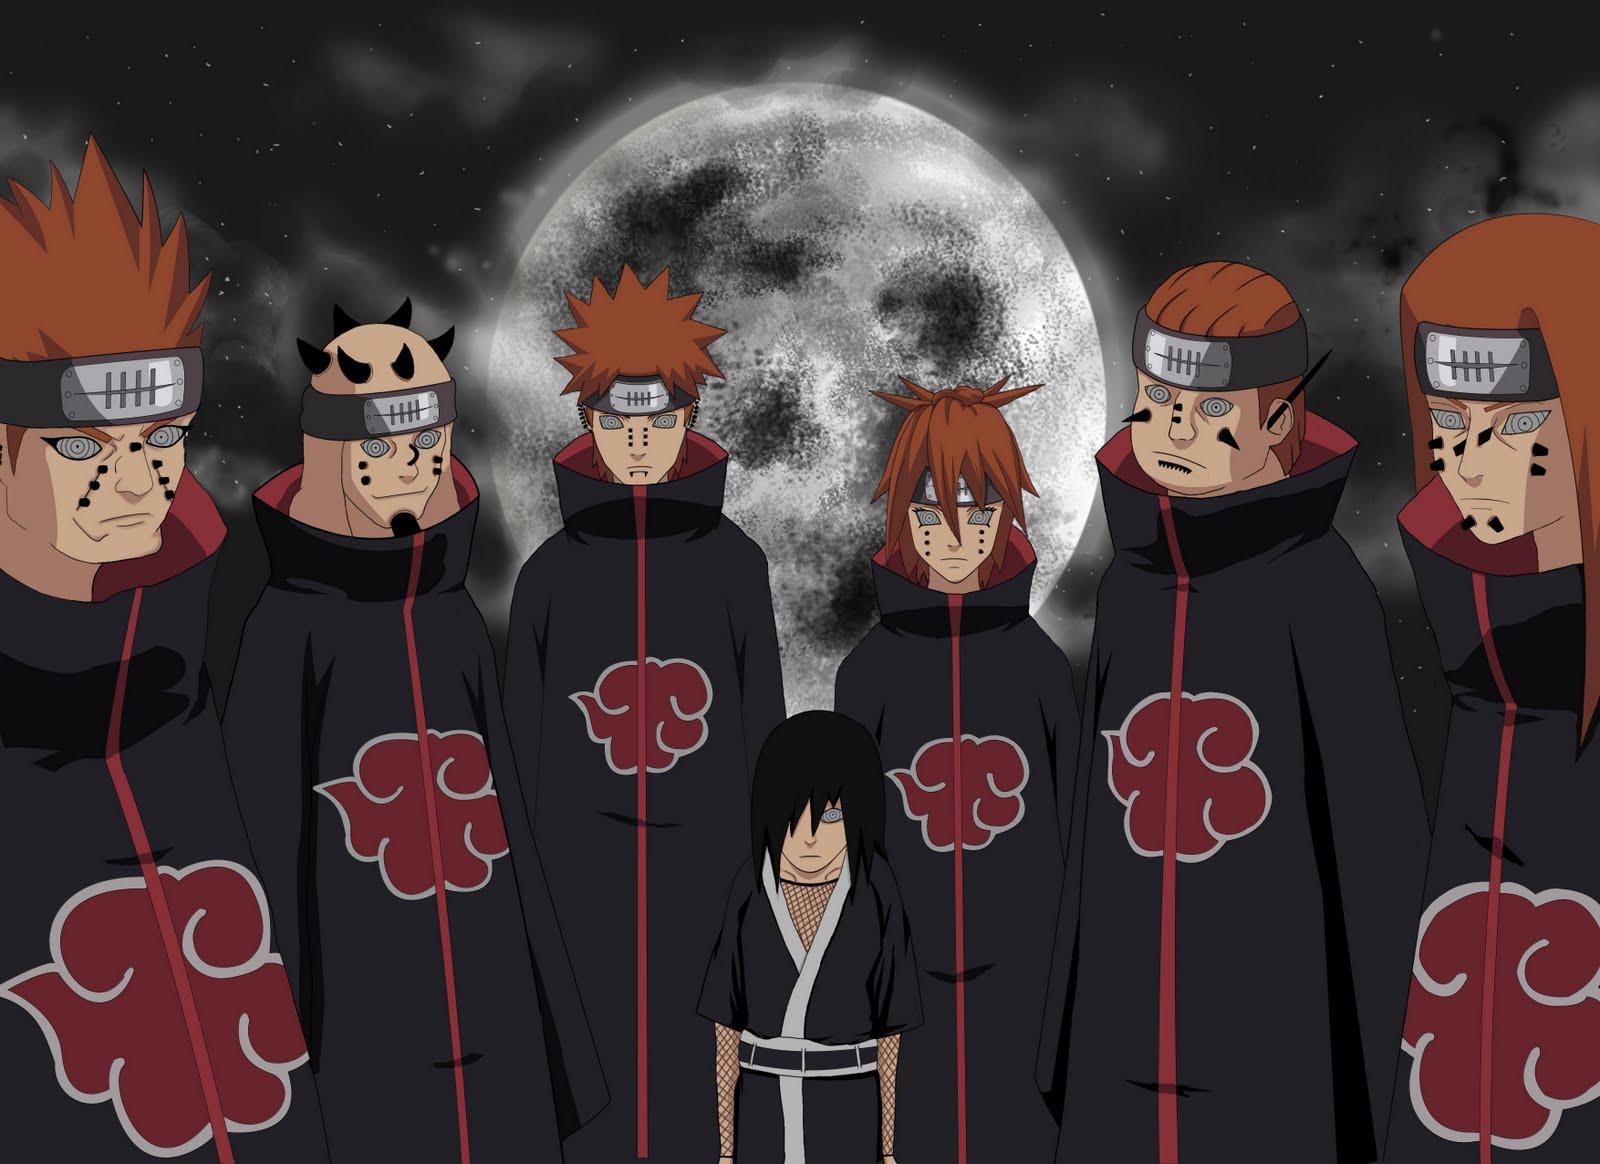 FakhruddinEkoSaputro  Posted in About Naruto   0 CommentsNaruto Shippuden Akatsuki Pain